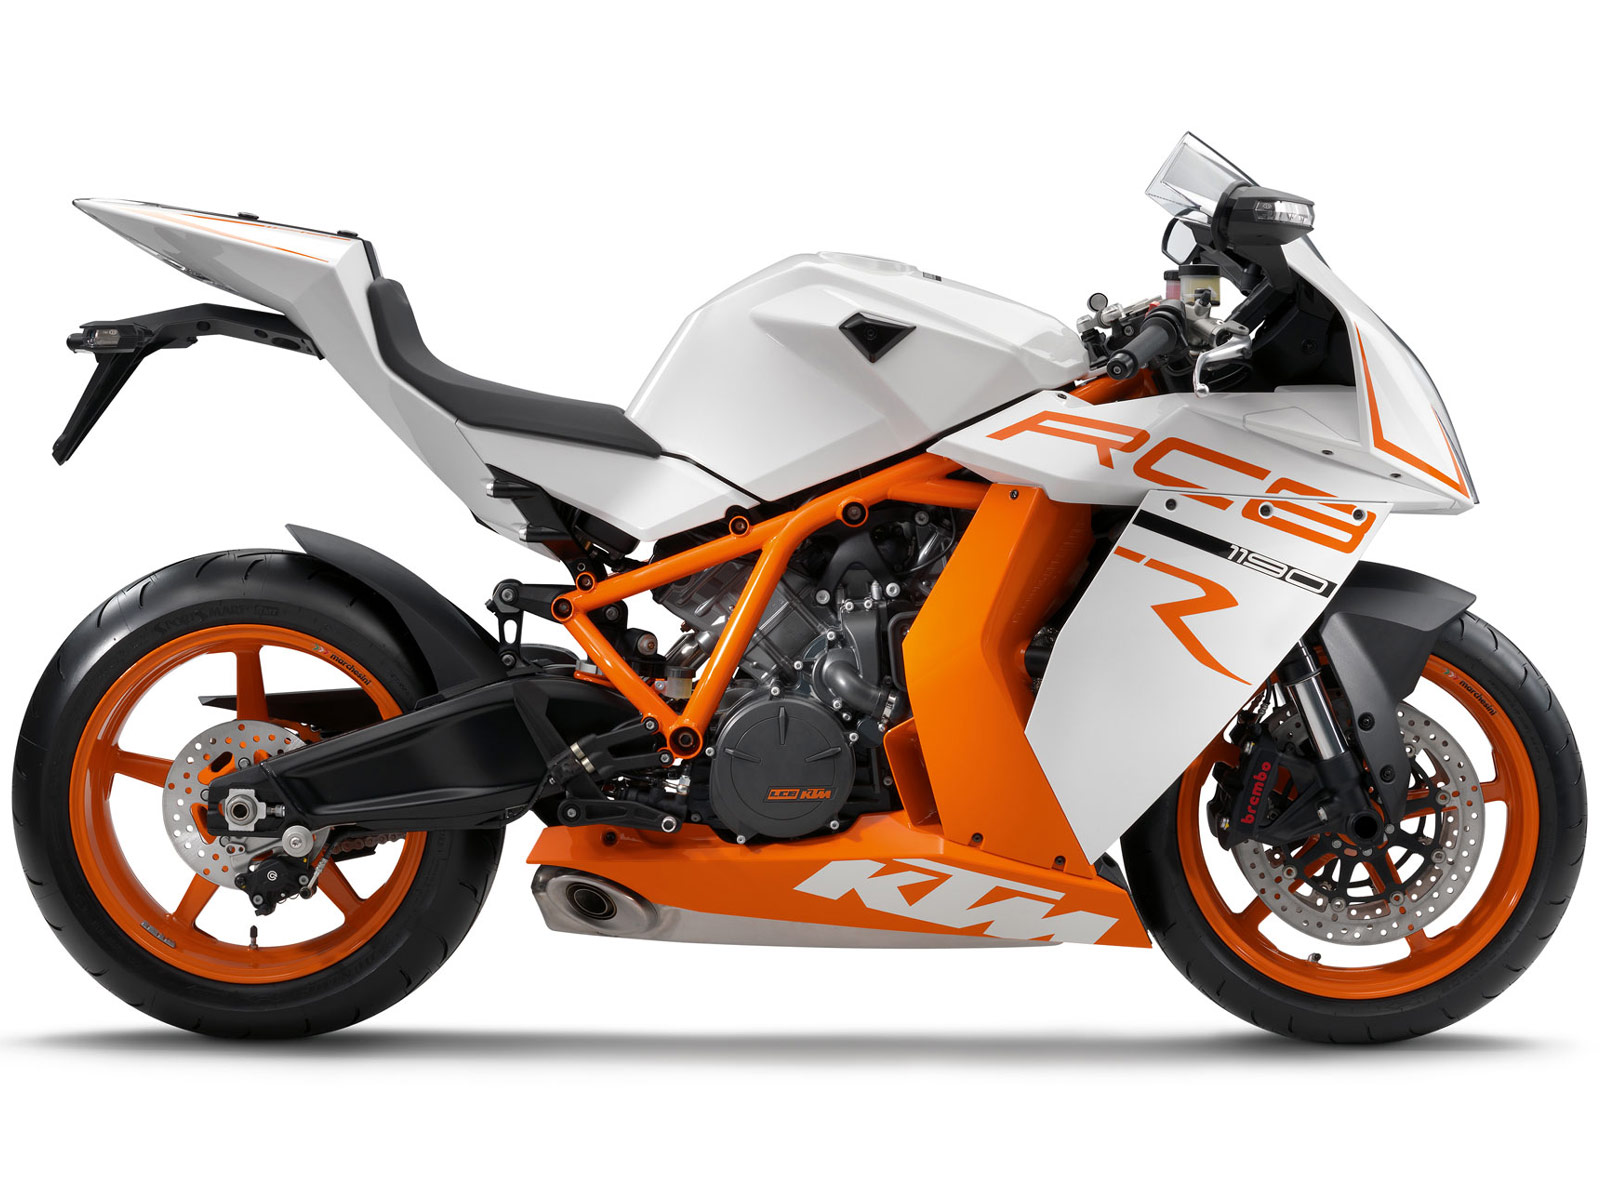 http://4.bp.blogspot.com/-_9FyPO9atP8/Tw7Sjgyxv4I/AAAAAAAAKG8/TURkUAT5Pyk/s1600/2012-KTM-1190-RC8R_motorcycle-desktop-wallpapers_3.jpg